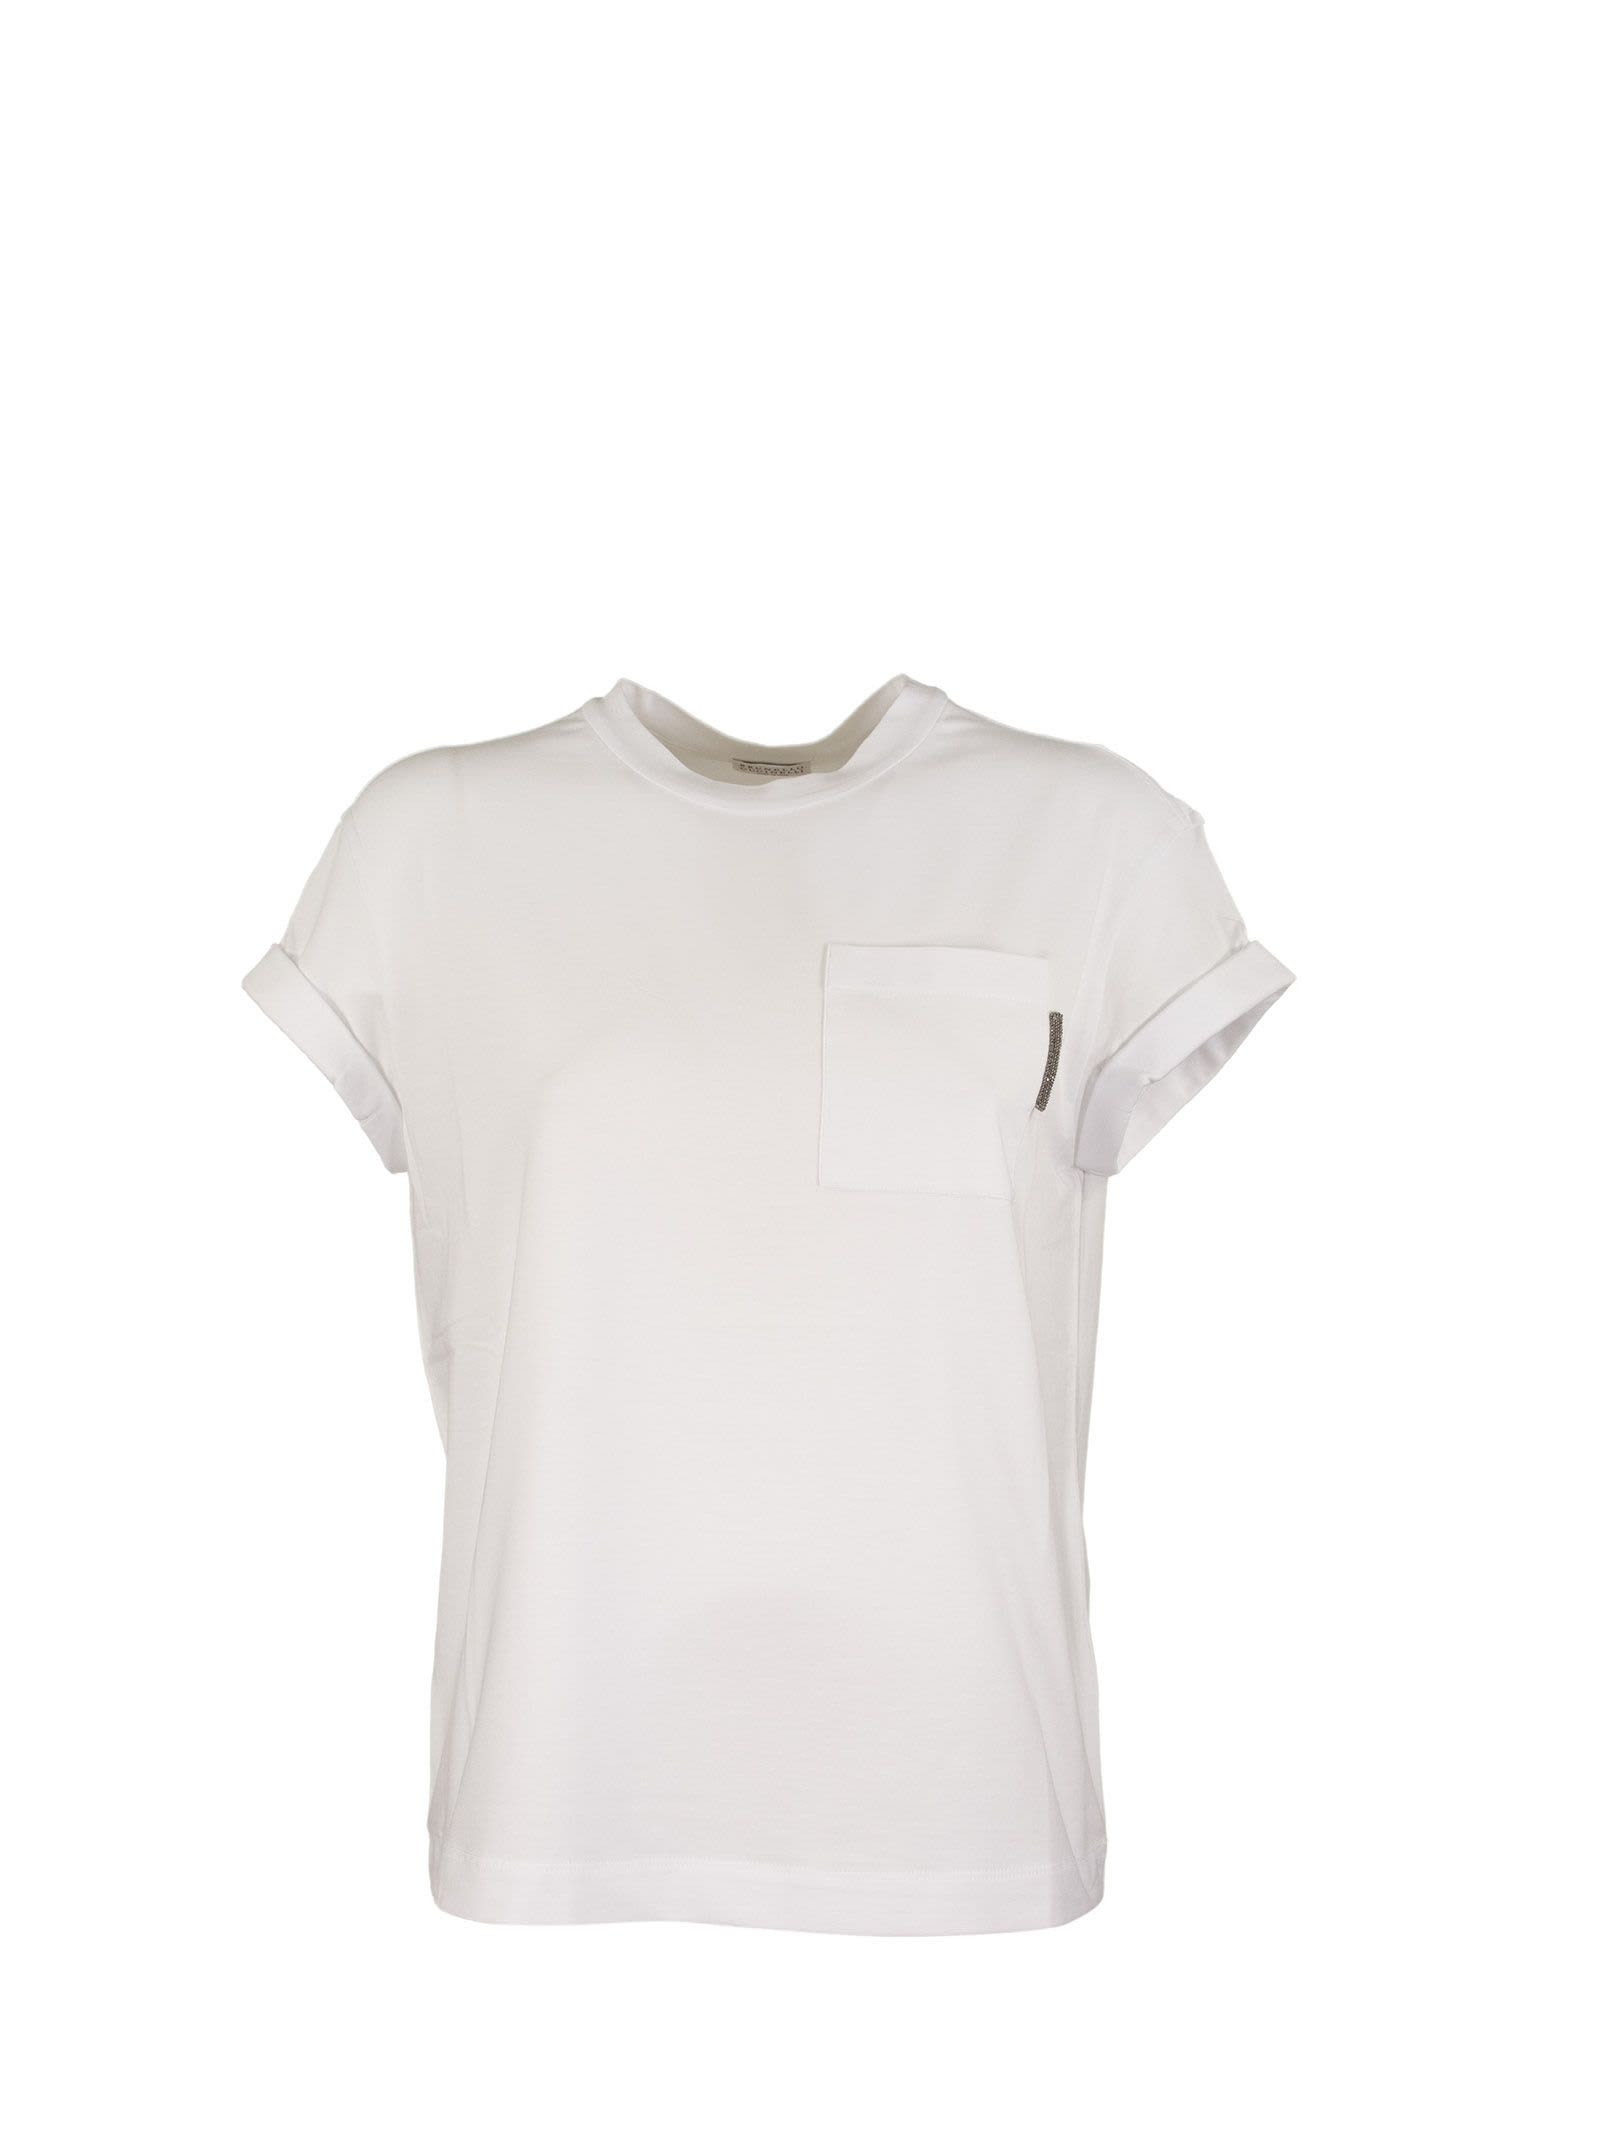 Short Sleeve T-shirt Cotton Jersey T-shirt With Precious Detail